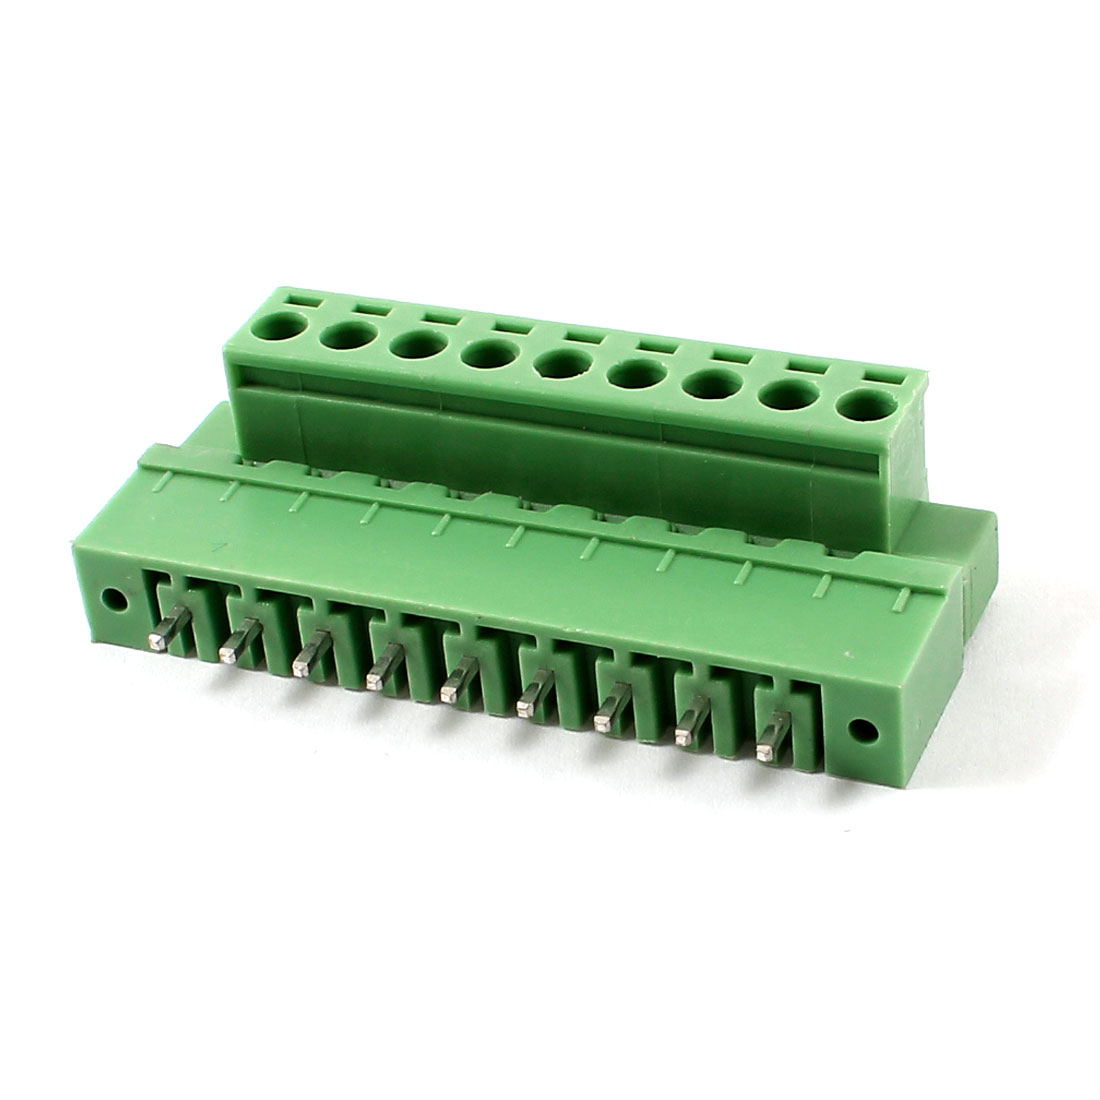 Pair 300V 10A 5.08mm Pitch 9 Pin Screw Plug In Terminal Block Green